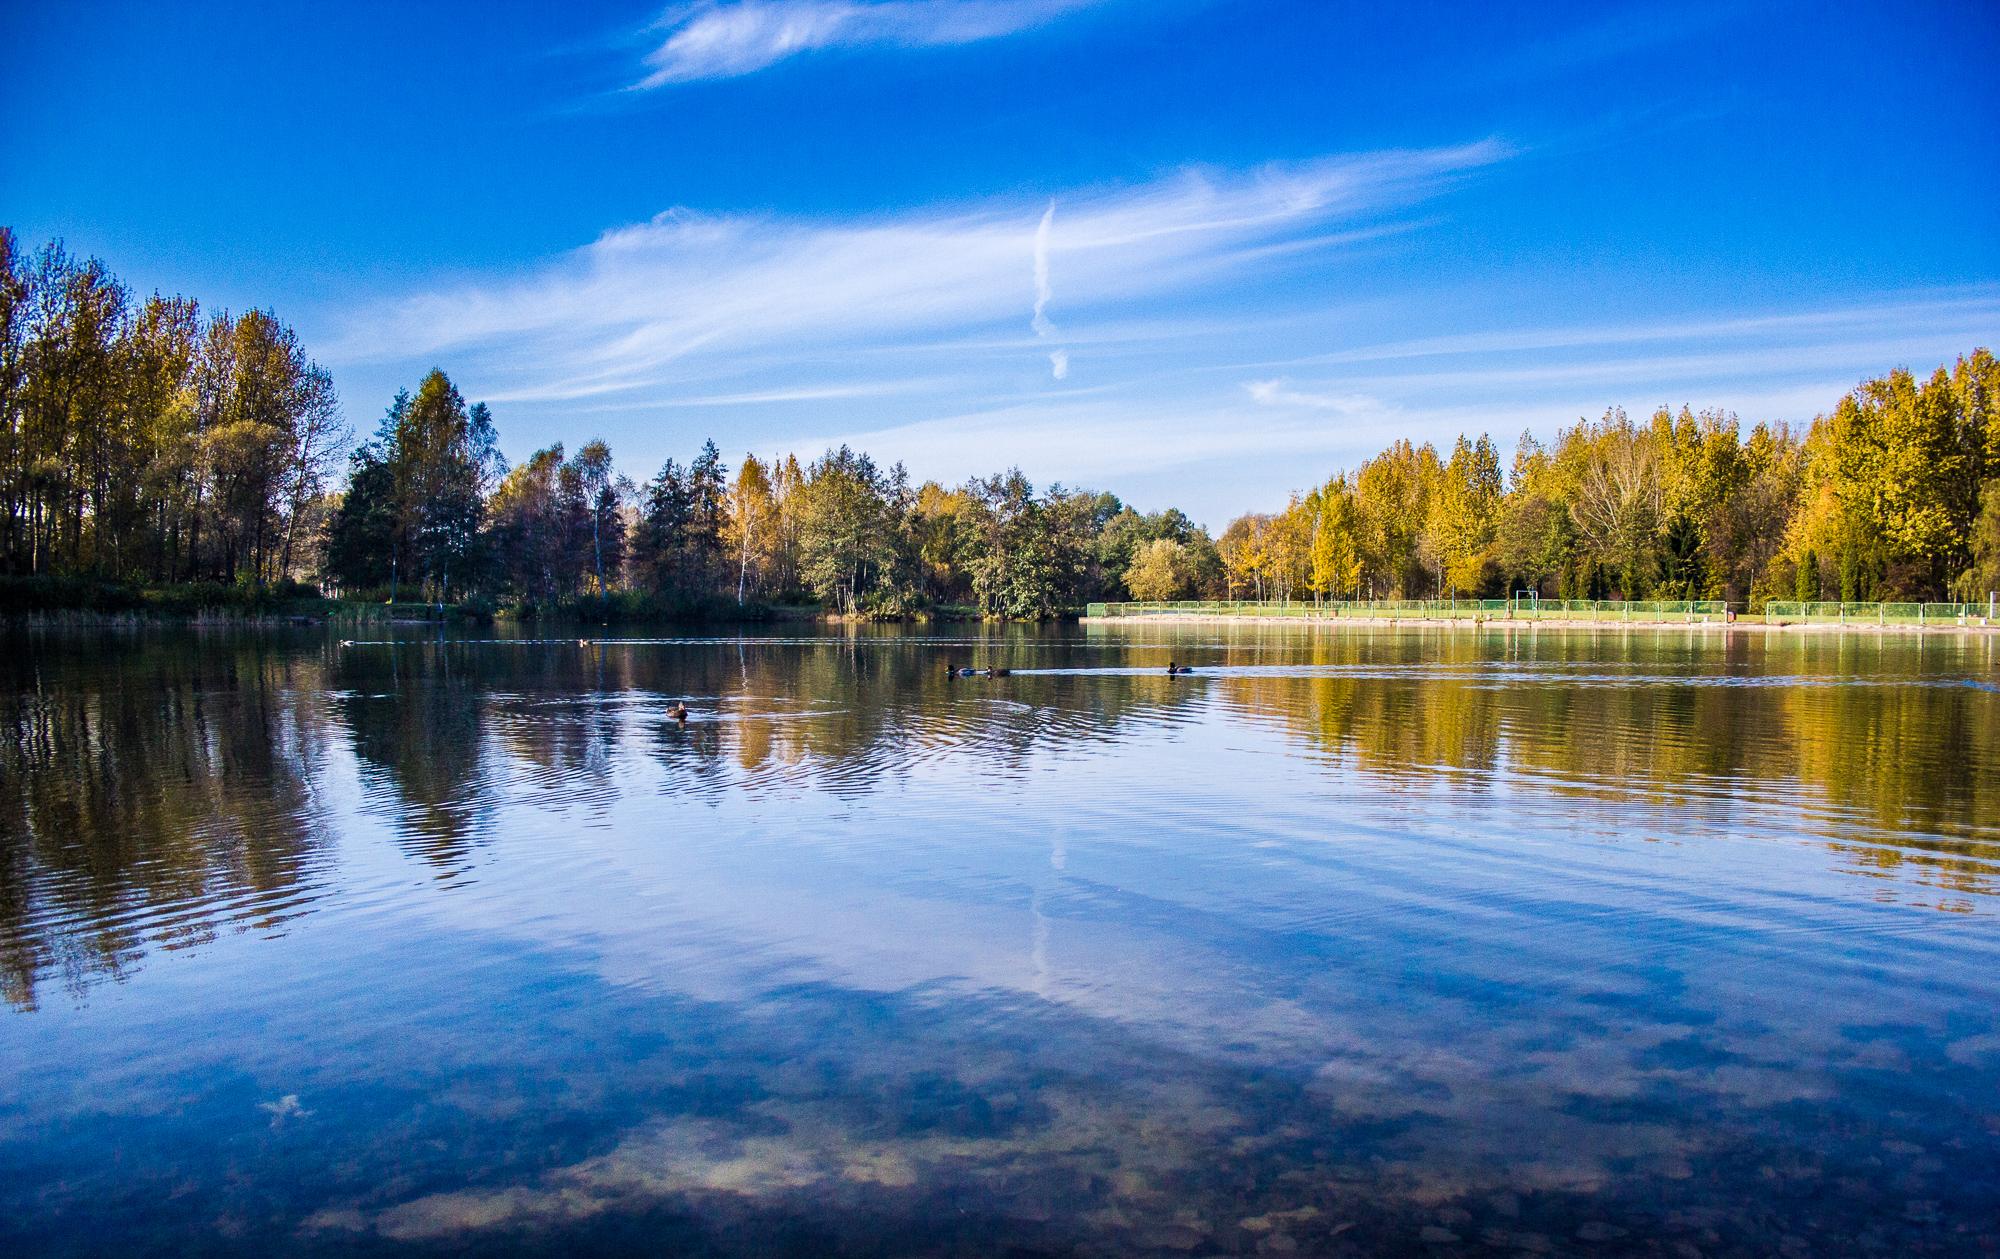 Free Images : Landscape, Tree, Nature, Cloud, Sky